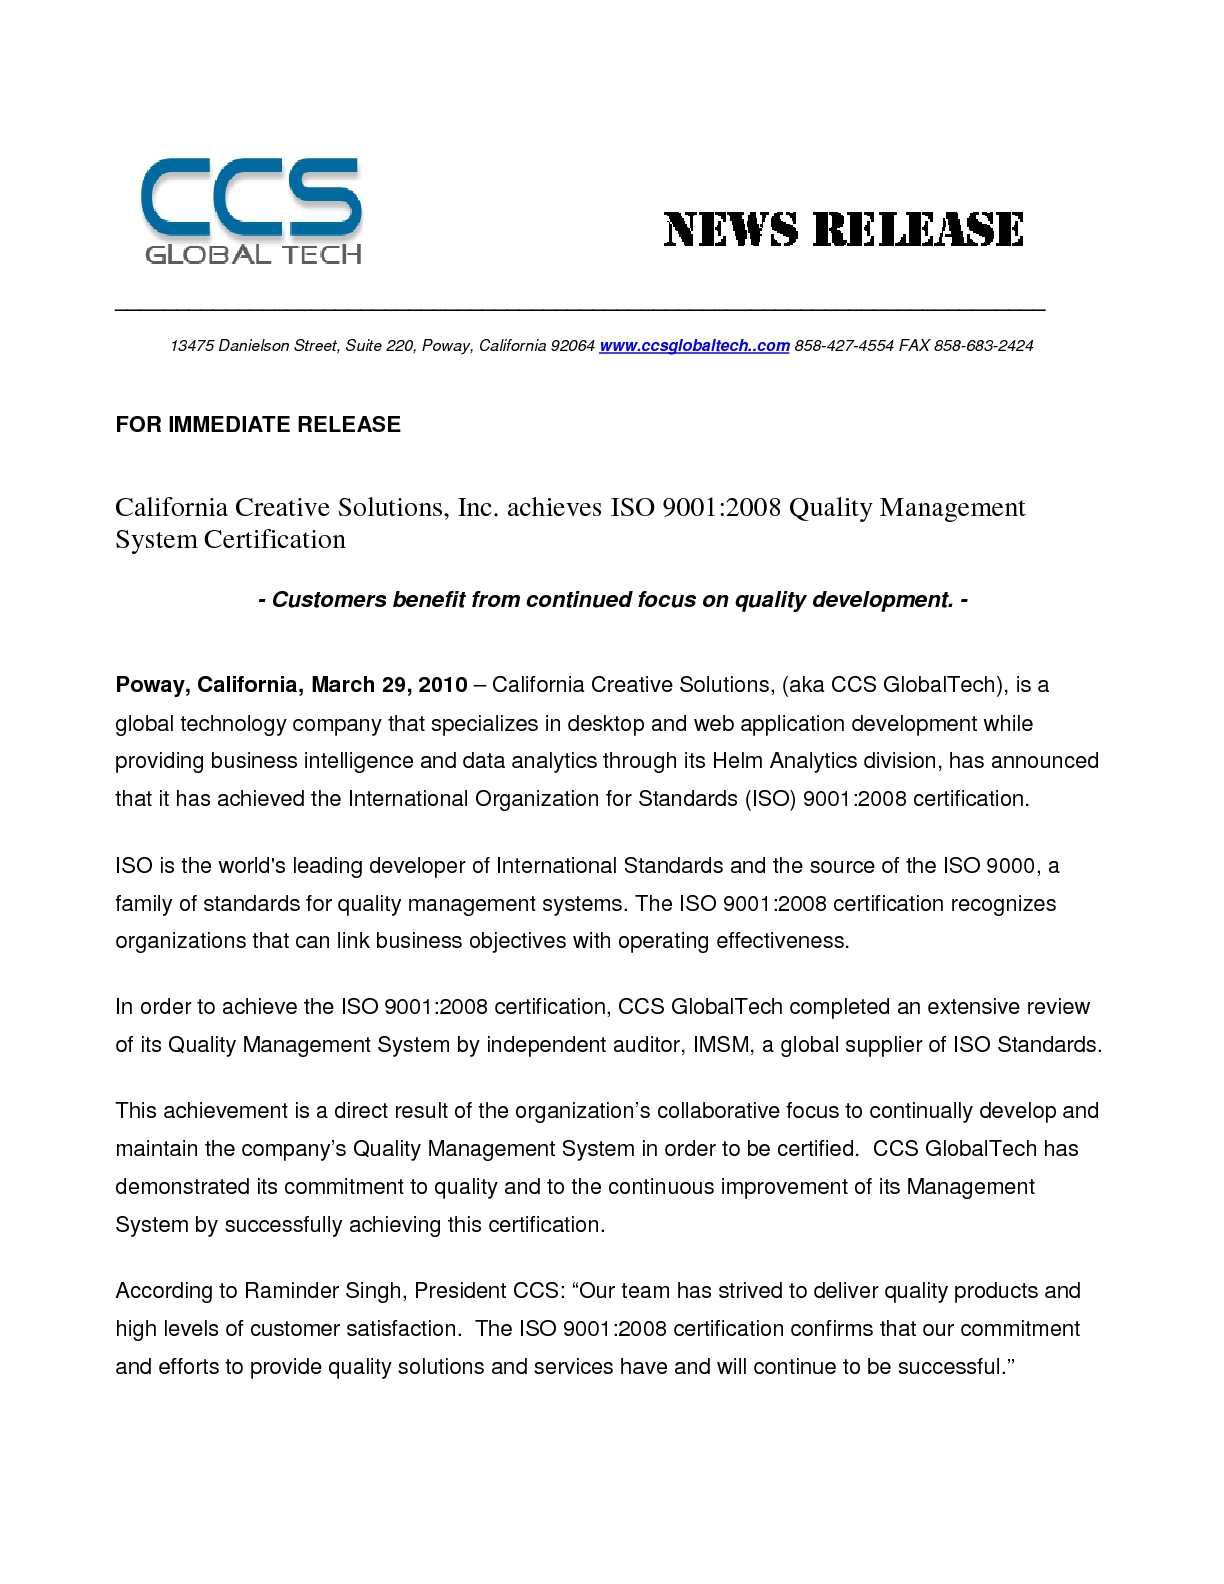 Calamo California Creative Solutions Immediate Releasepdf